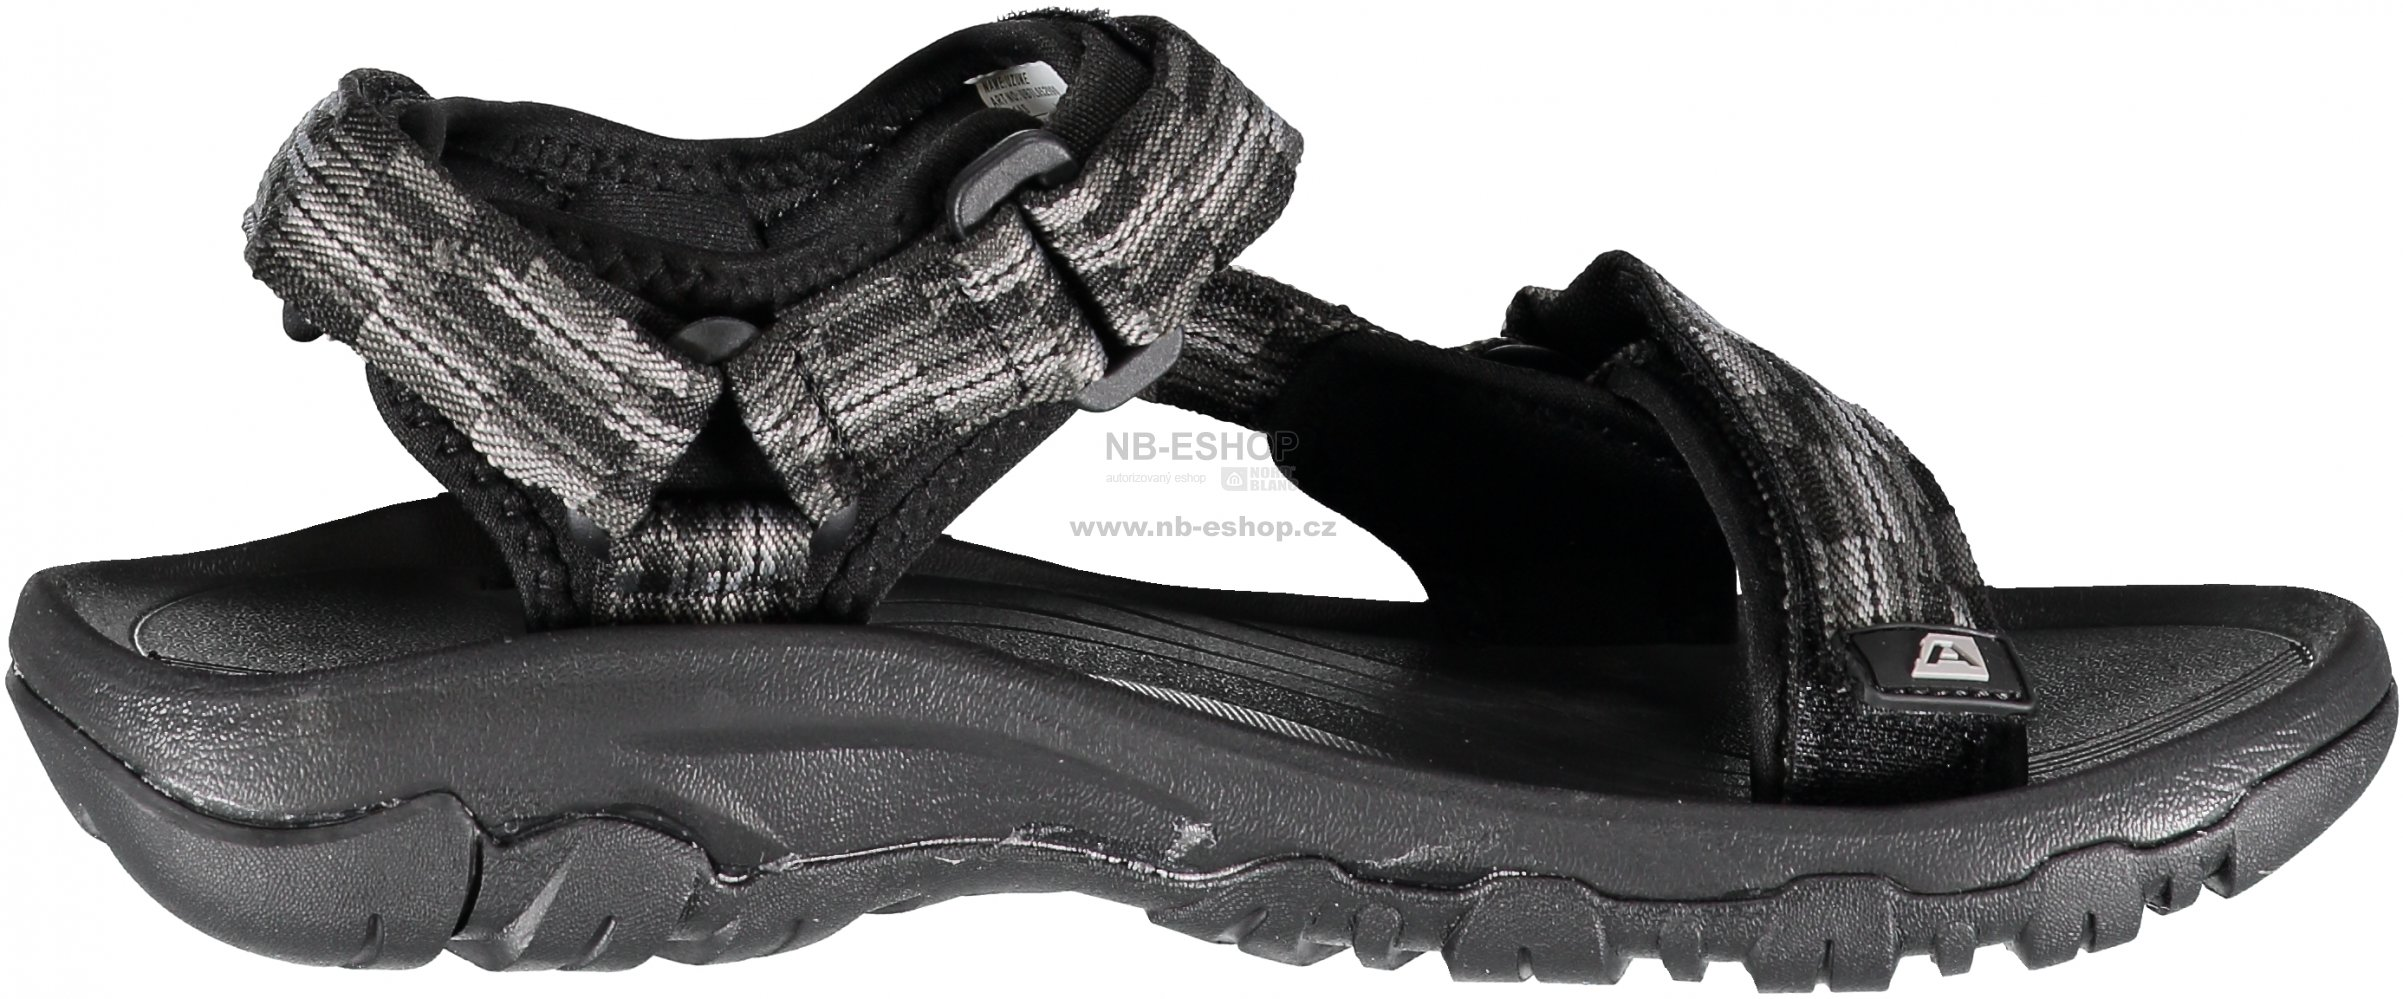 27b2b5b5346 Dámské sandále ALPINE PRO UZUME UBTL052 ČERNÁ velikost  EU 40 (UK 6 ...